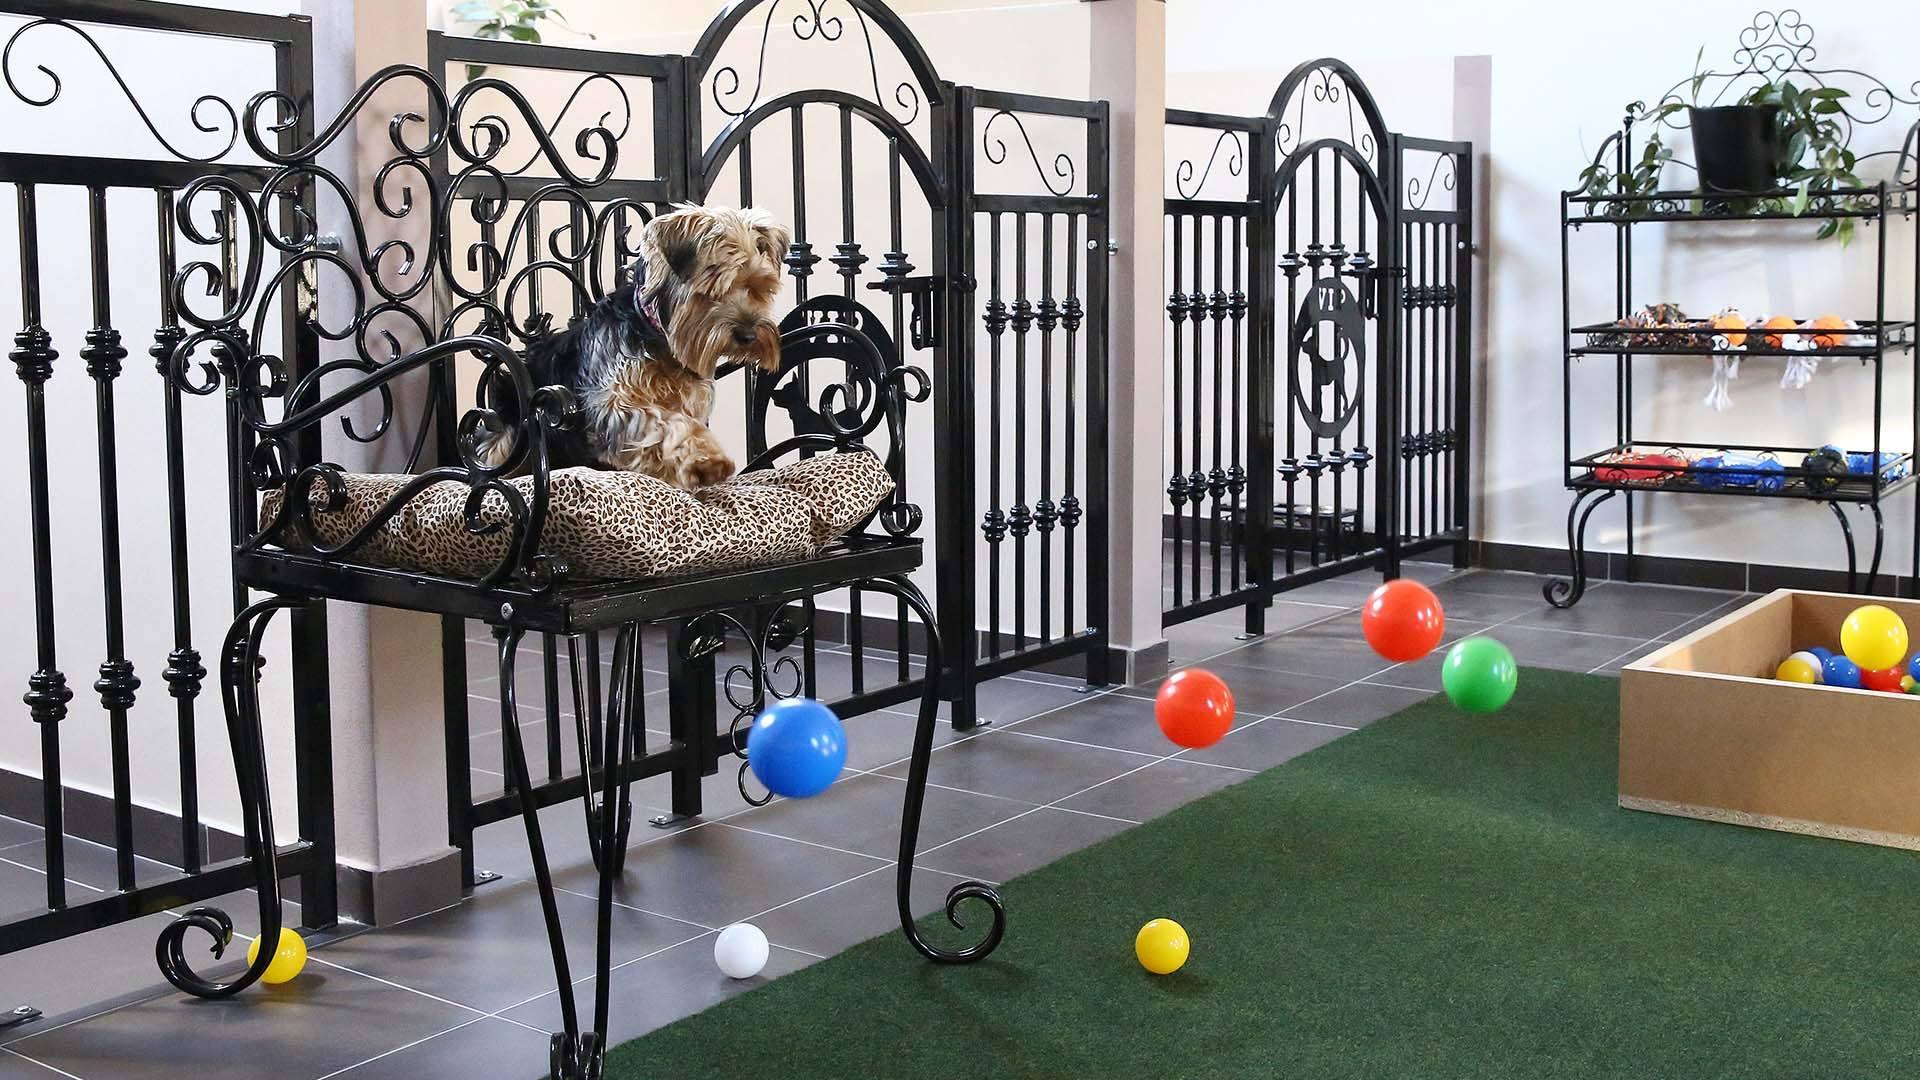 Hala hotelu pro psy VIP Pets